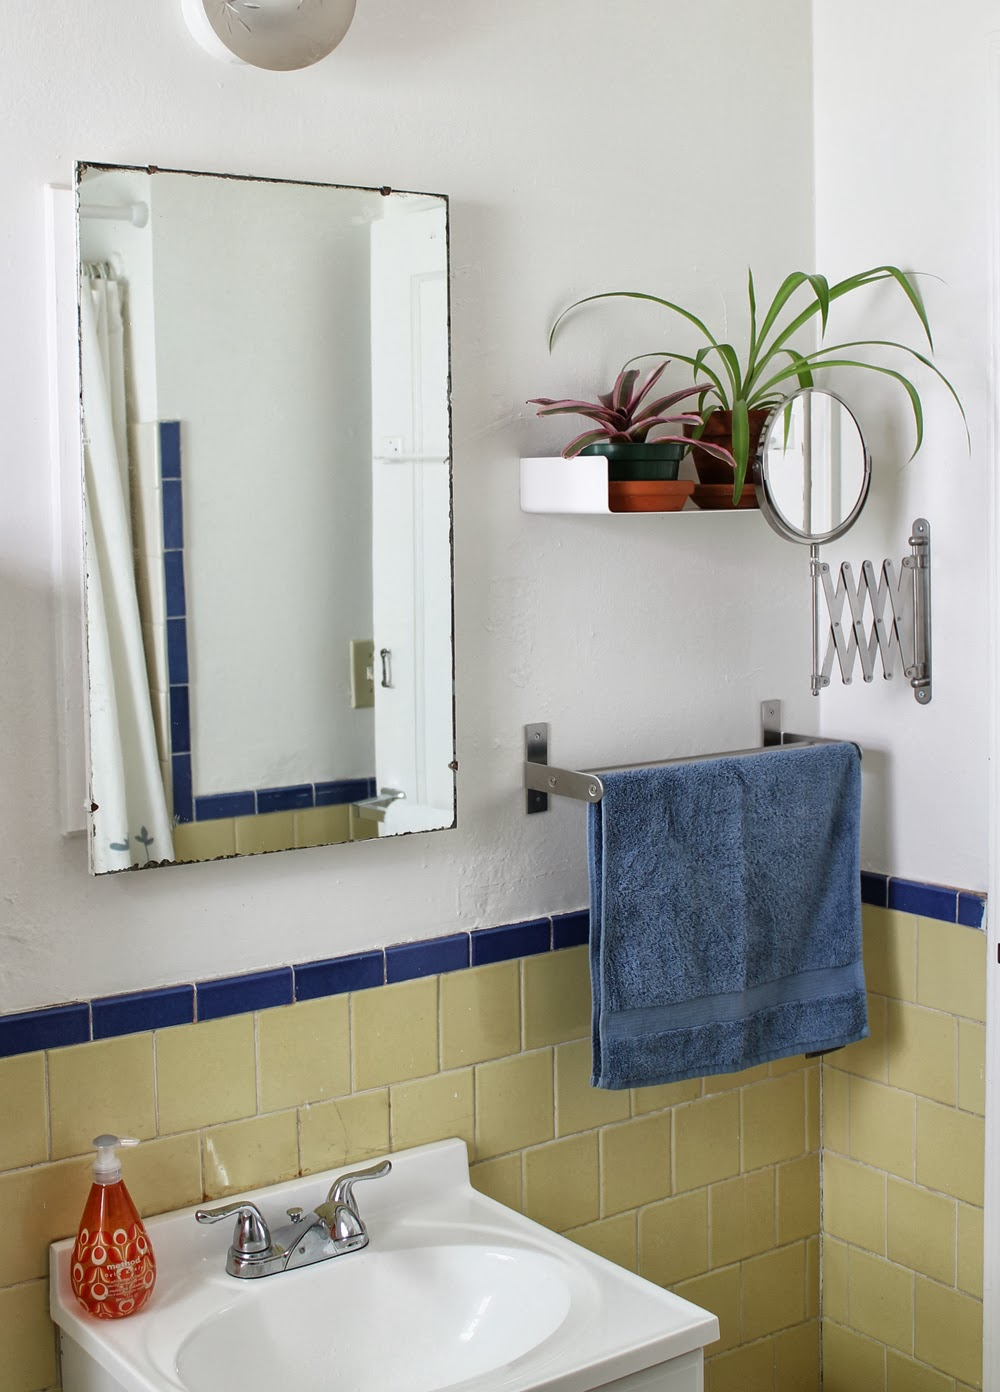 Pink Tile Bathroom Makeover Of the pink tile floor as